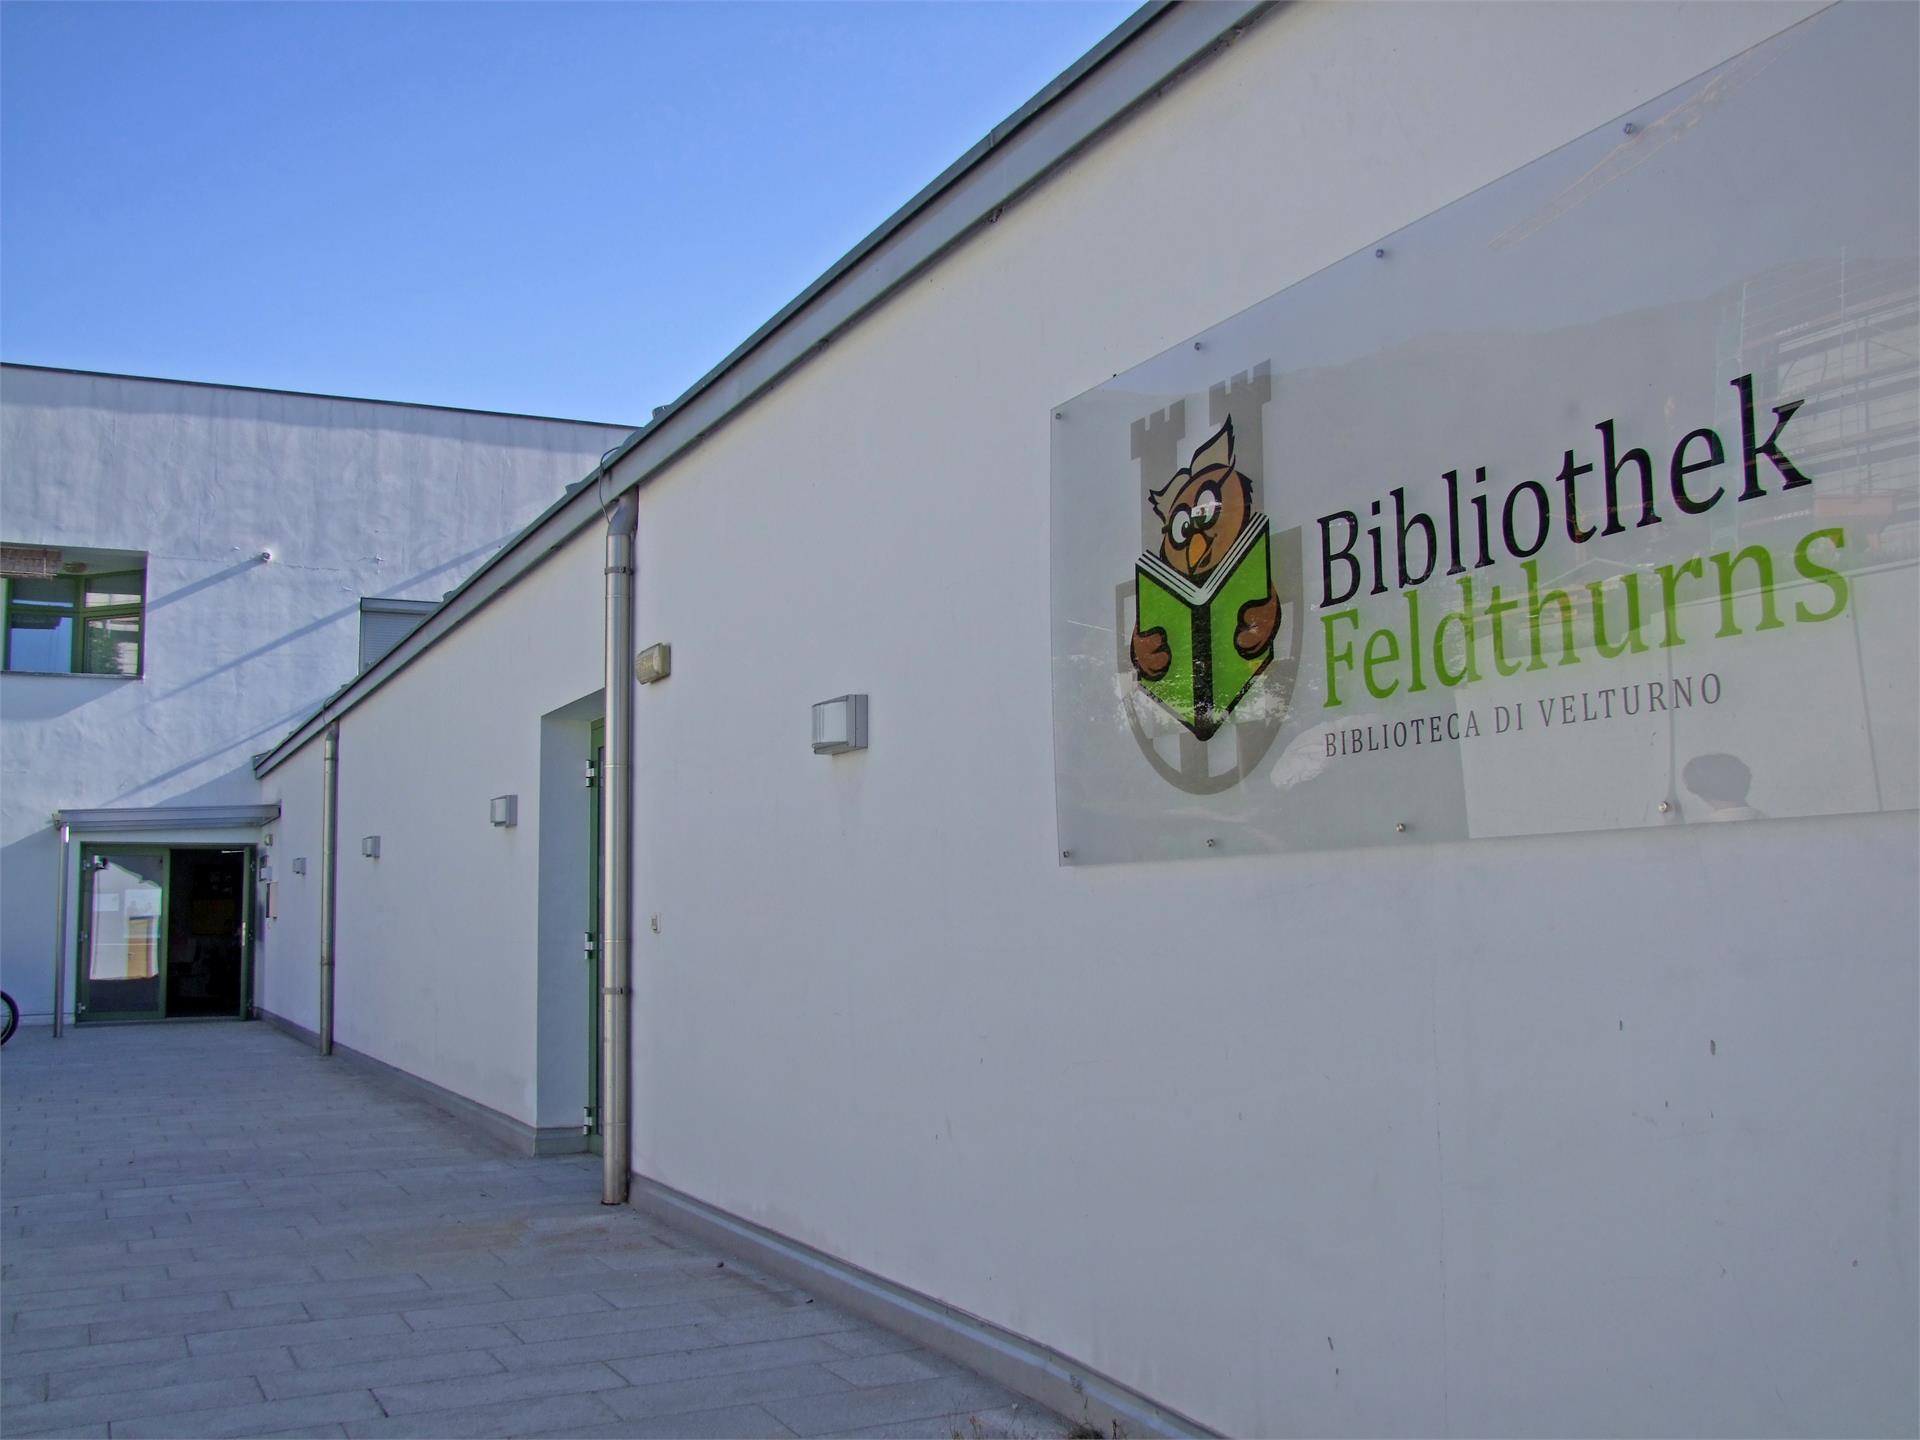 Library Velturno